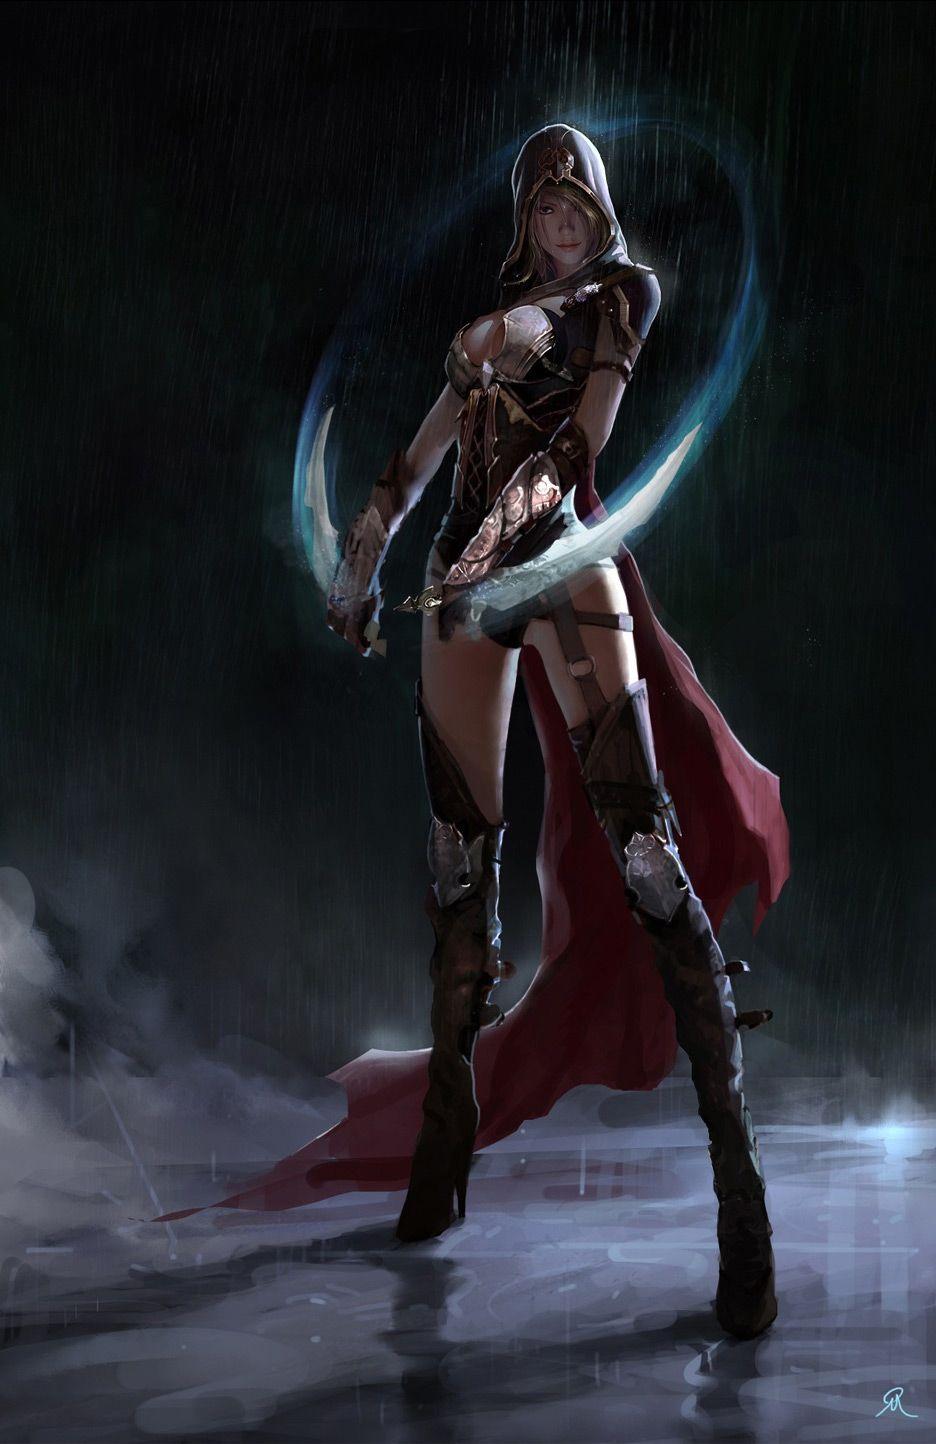 Pin By Ayela On Art Work That I Love Female Assassin Geek Art Fantasy Women